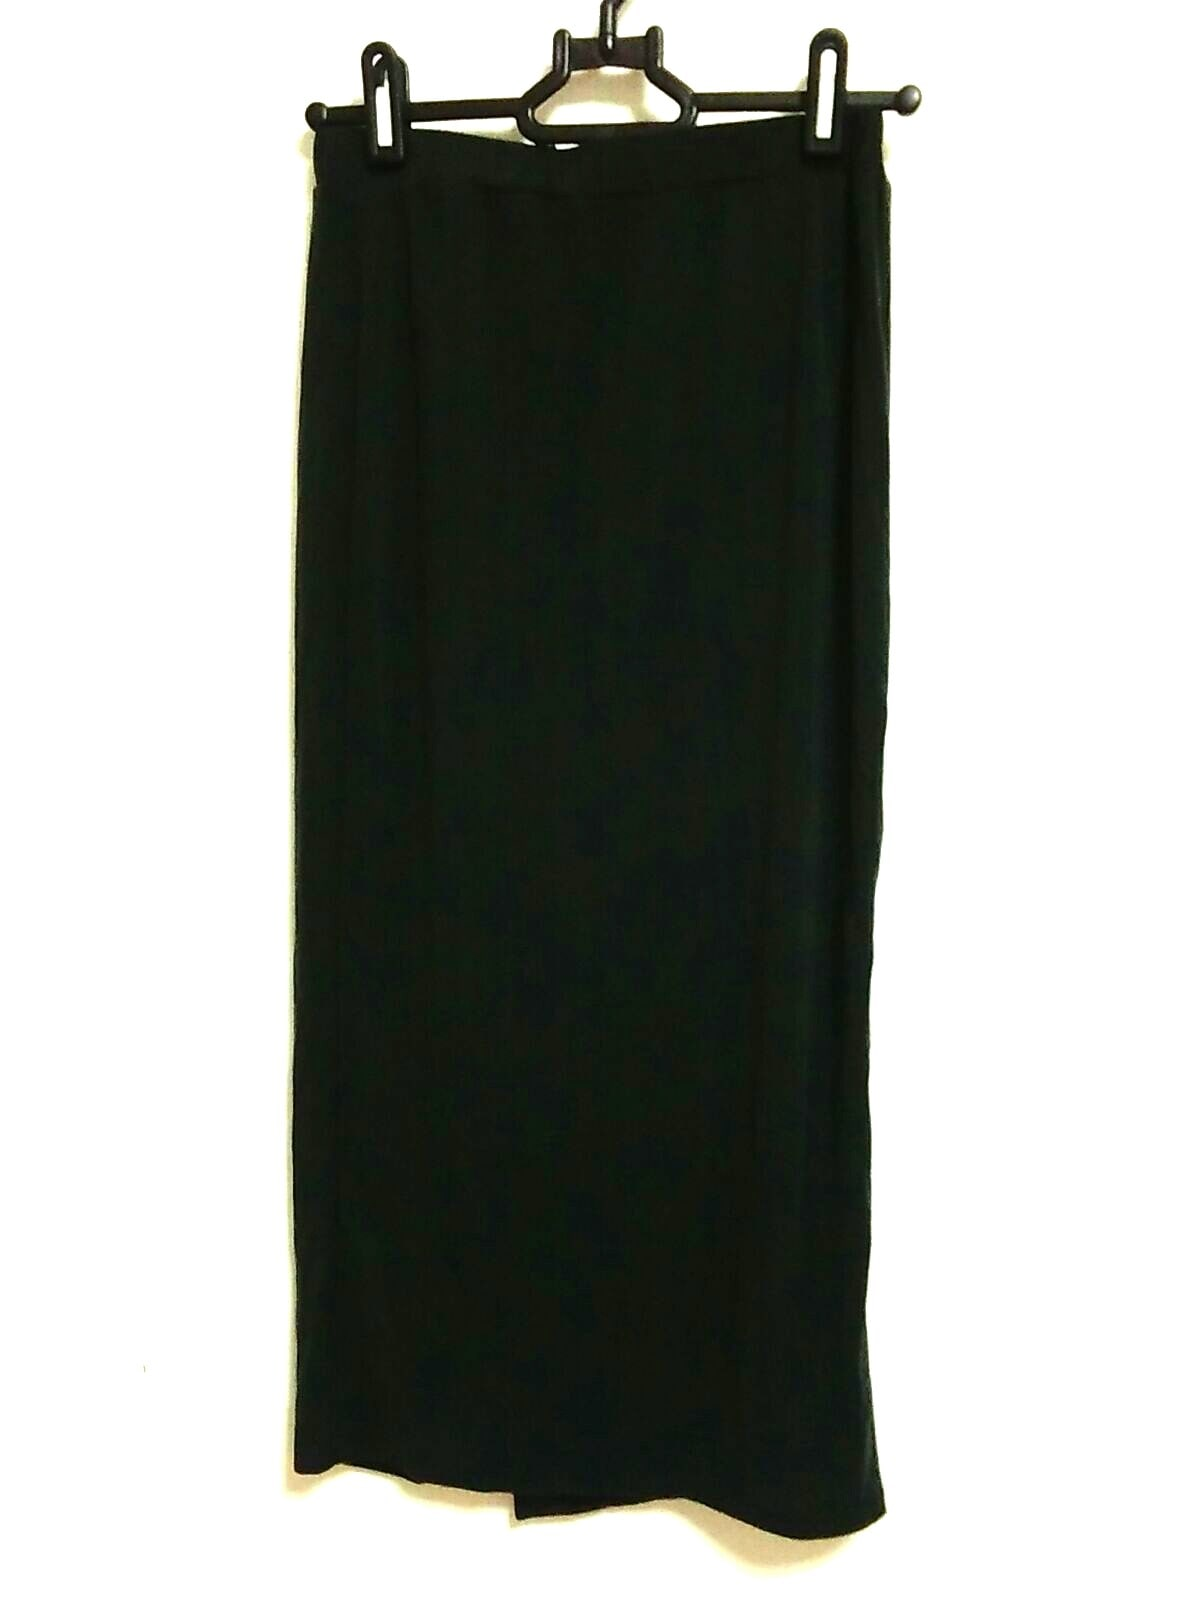 TheDayztokyo(ザデイズトウキョウ)のスカート